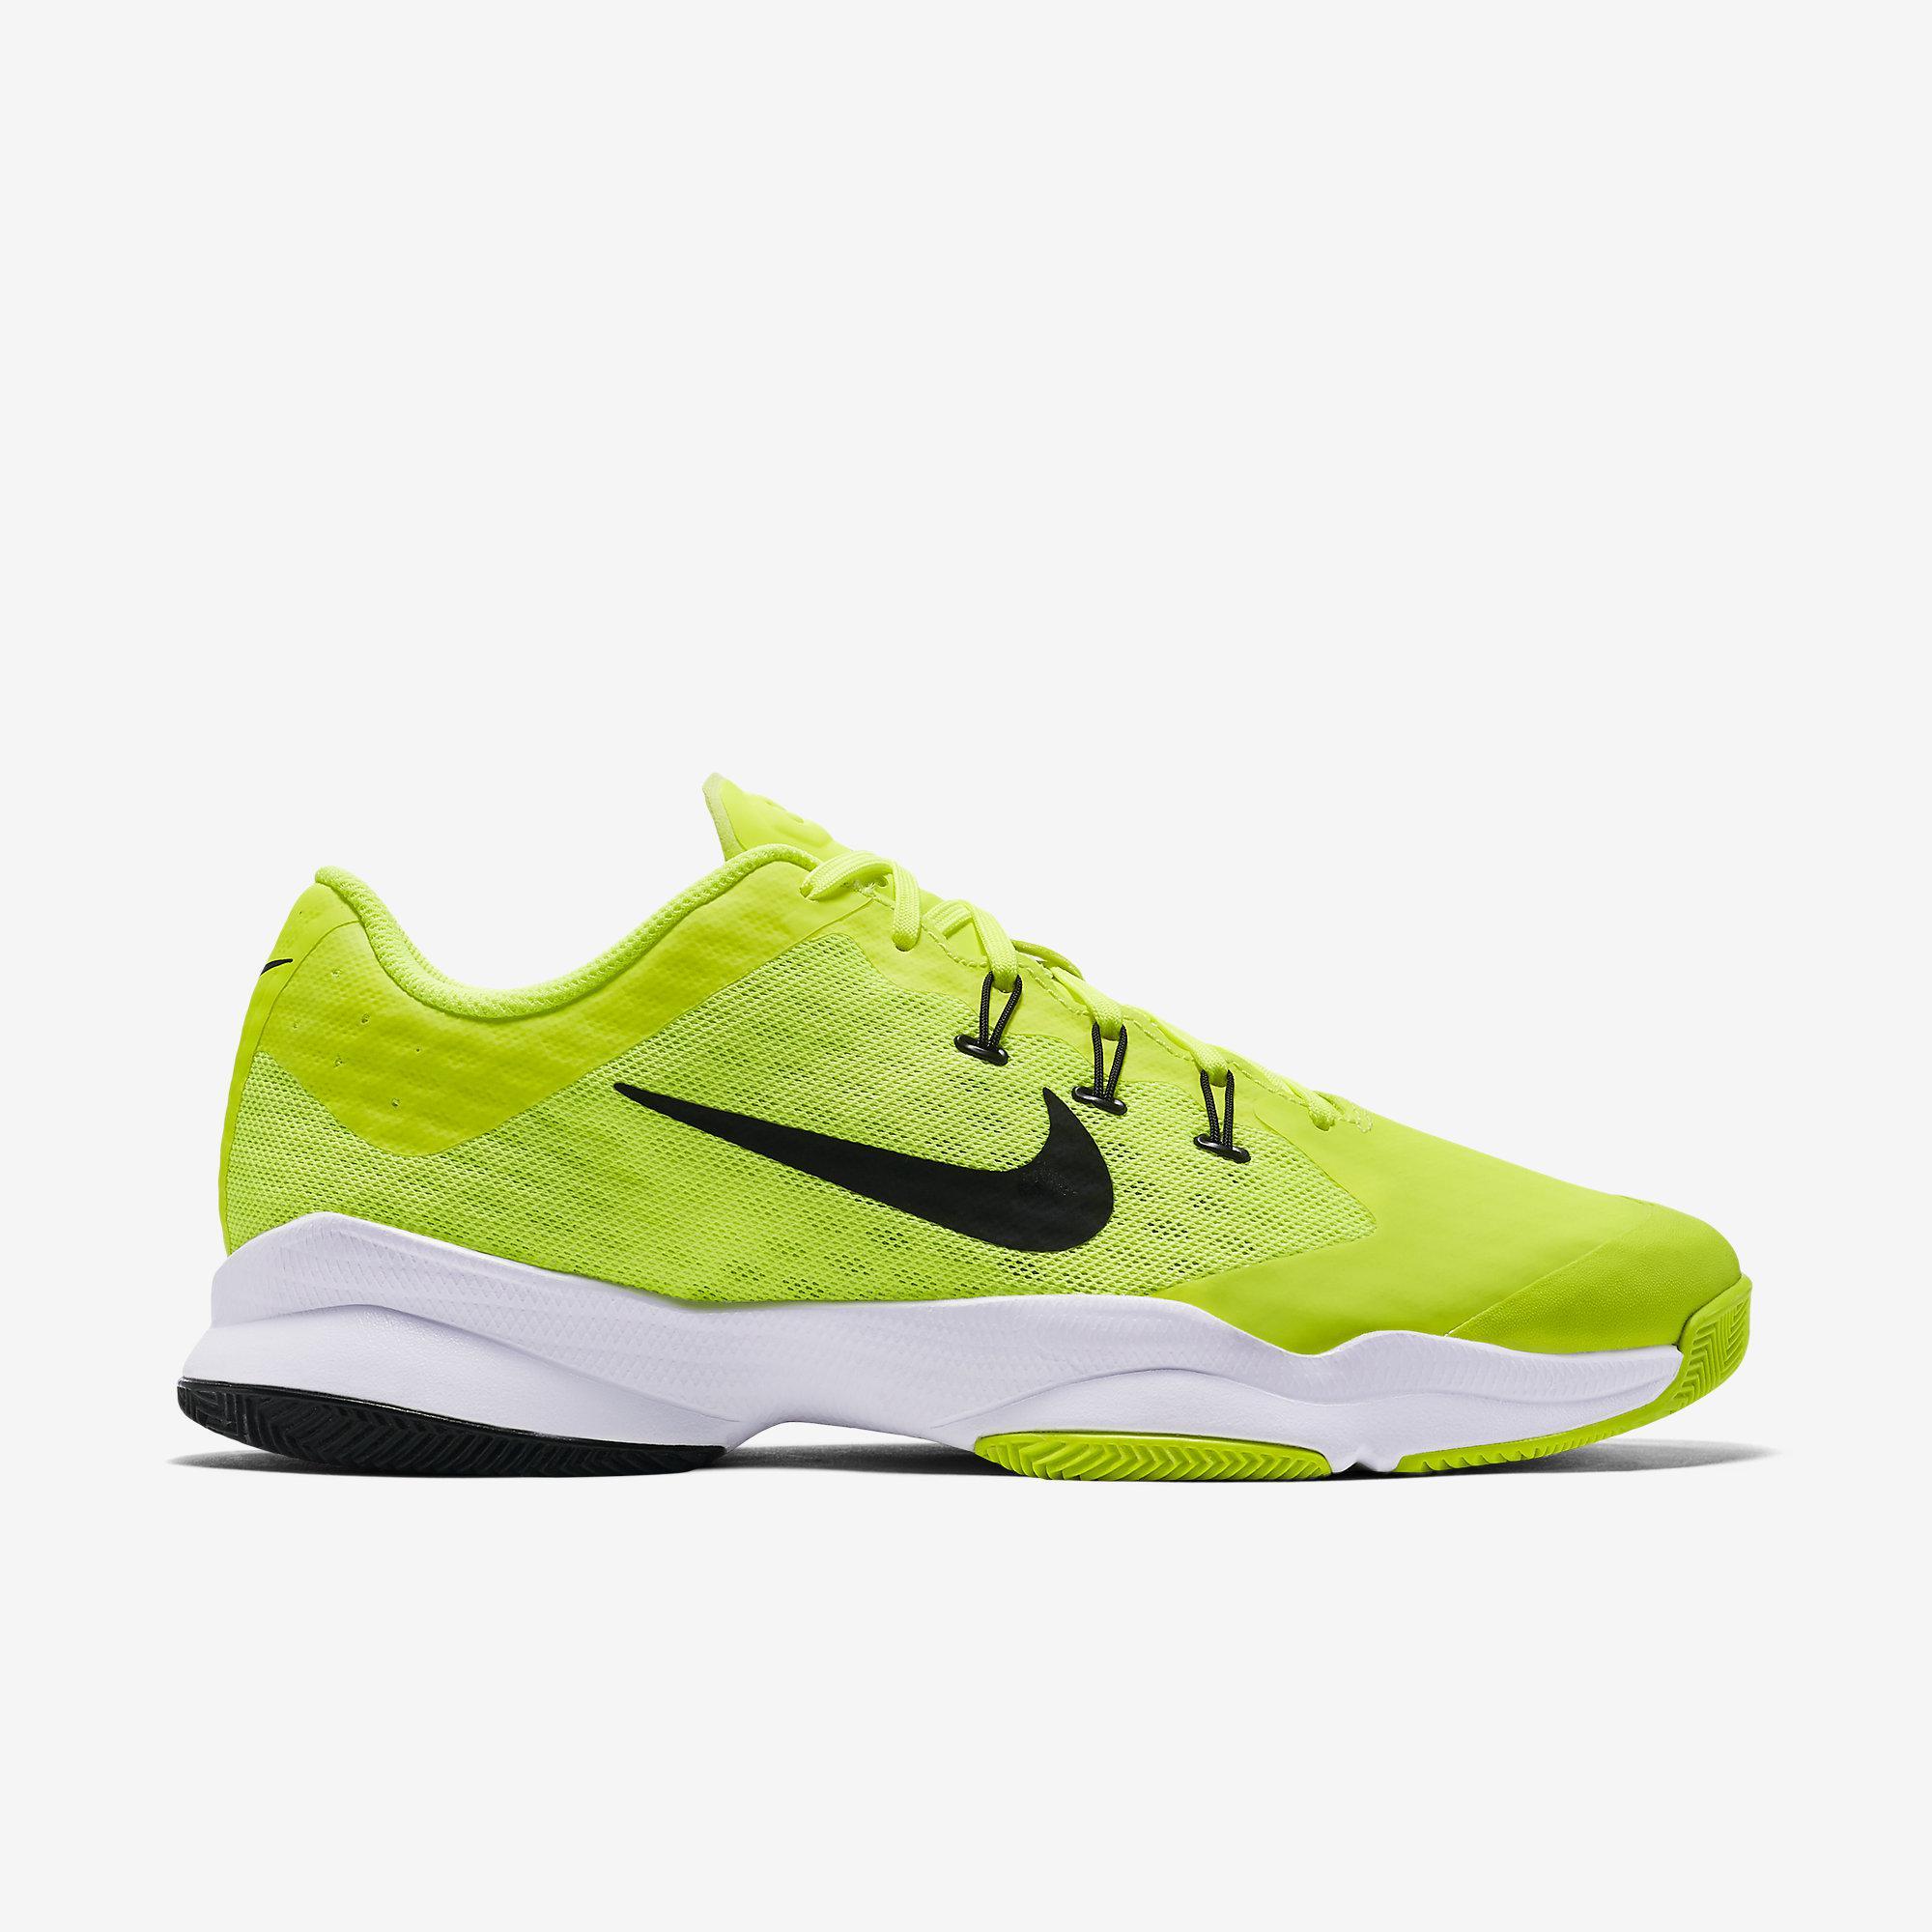 Nike Mens Air Zoom Ultra Tennis Shoes - Volt